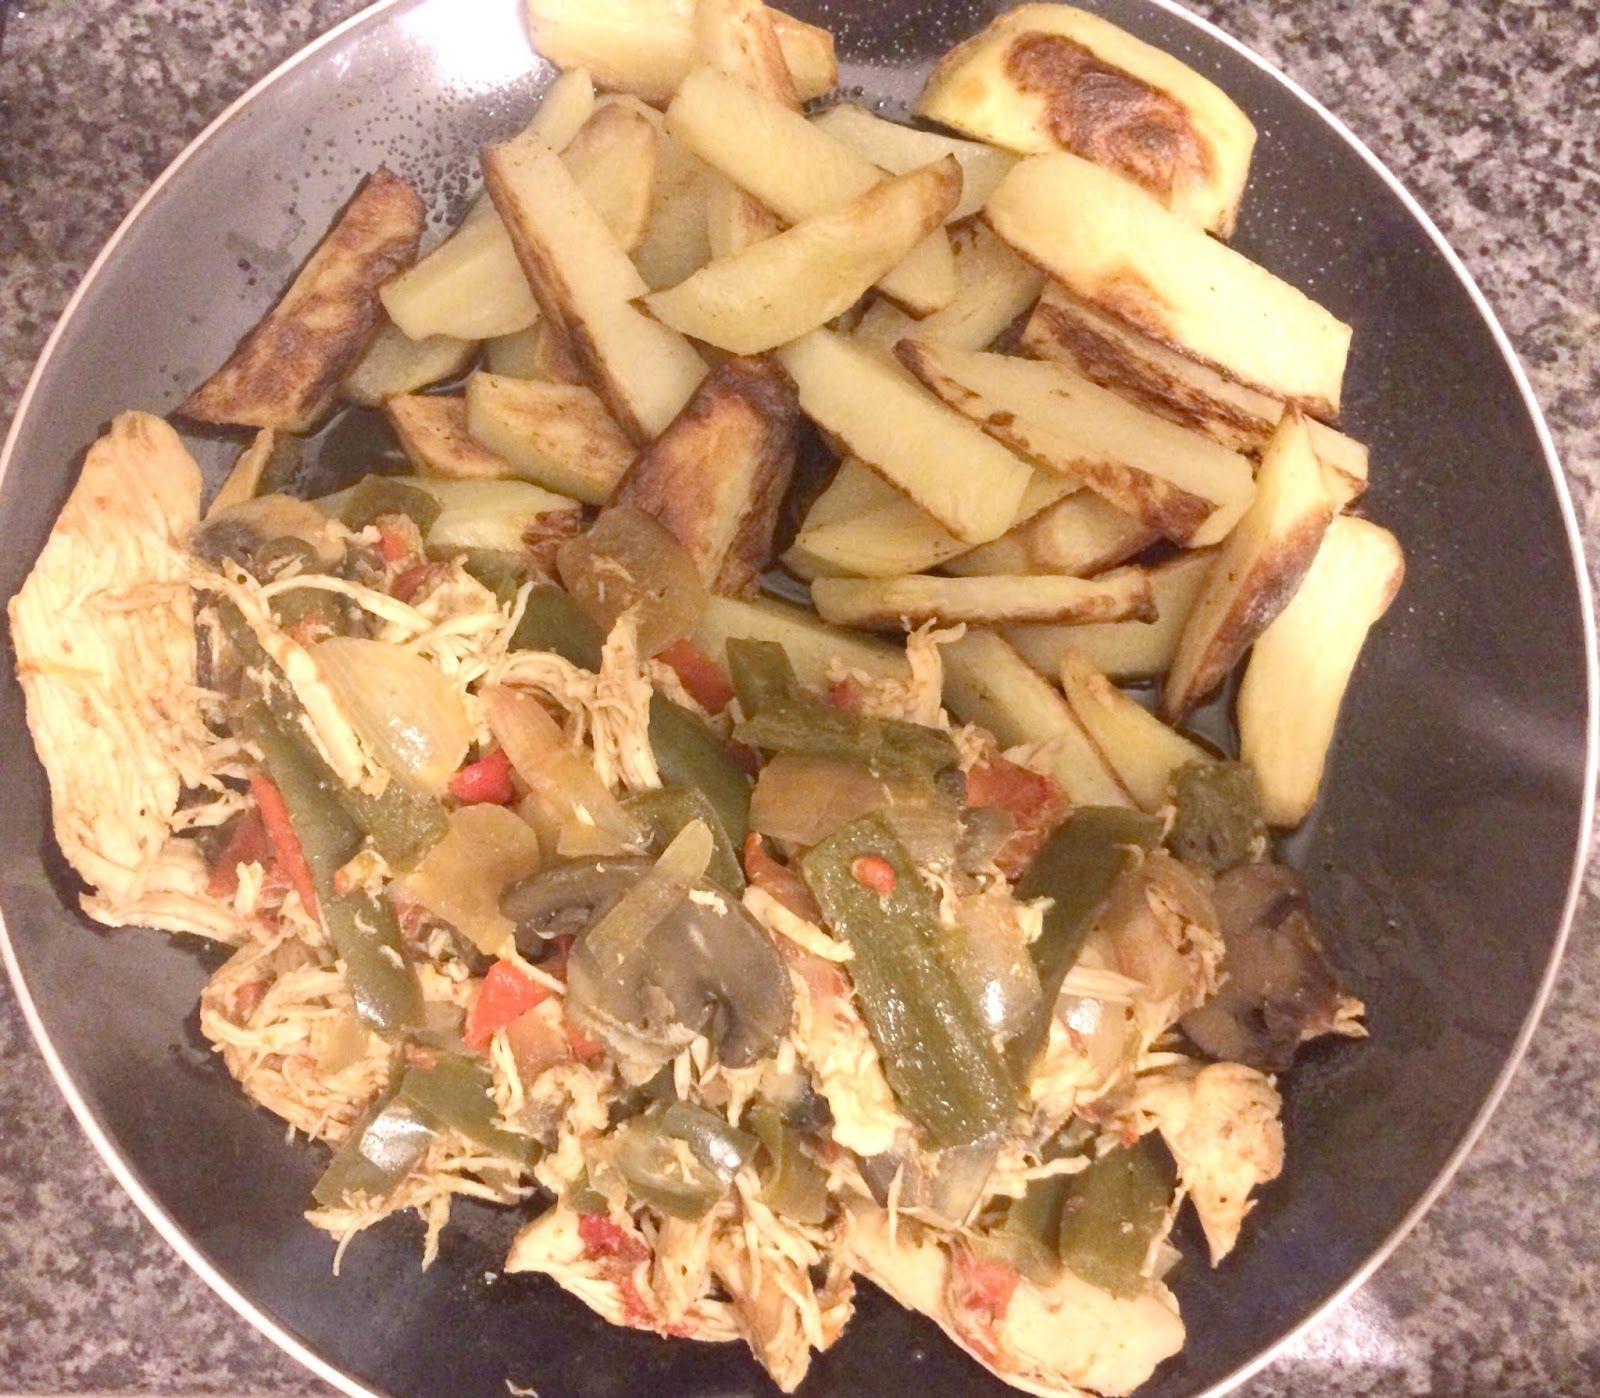 Slimming World Slow Cooker Chicken Fajitas Recipe Slow Cooker Chicken Slow Cooker Chicken